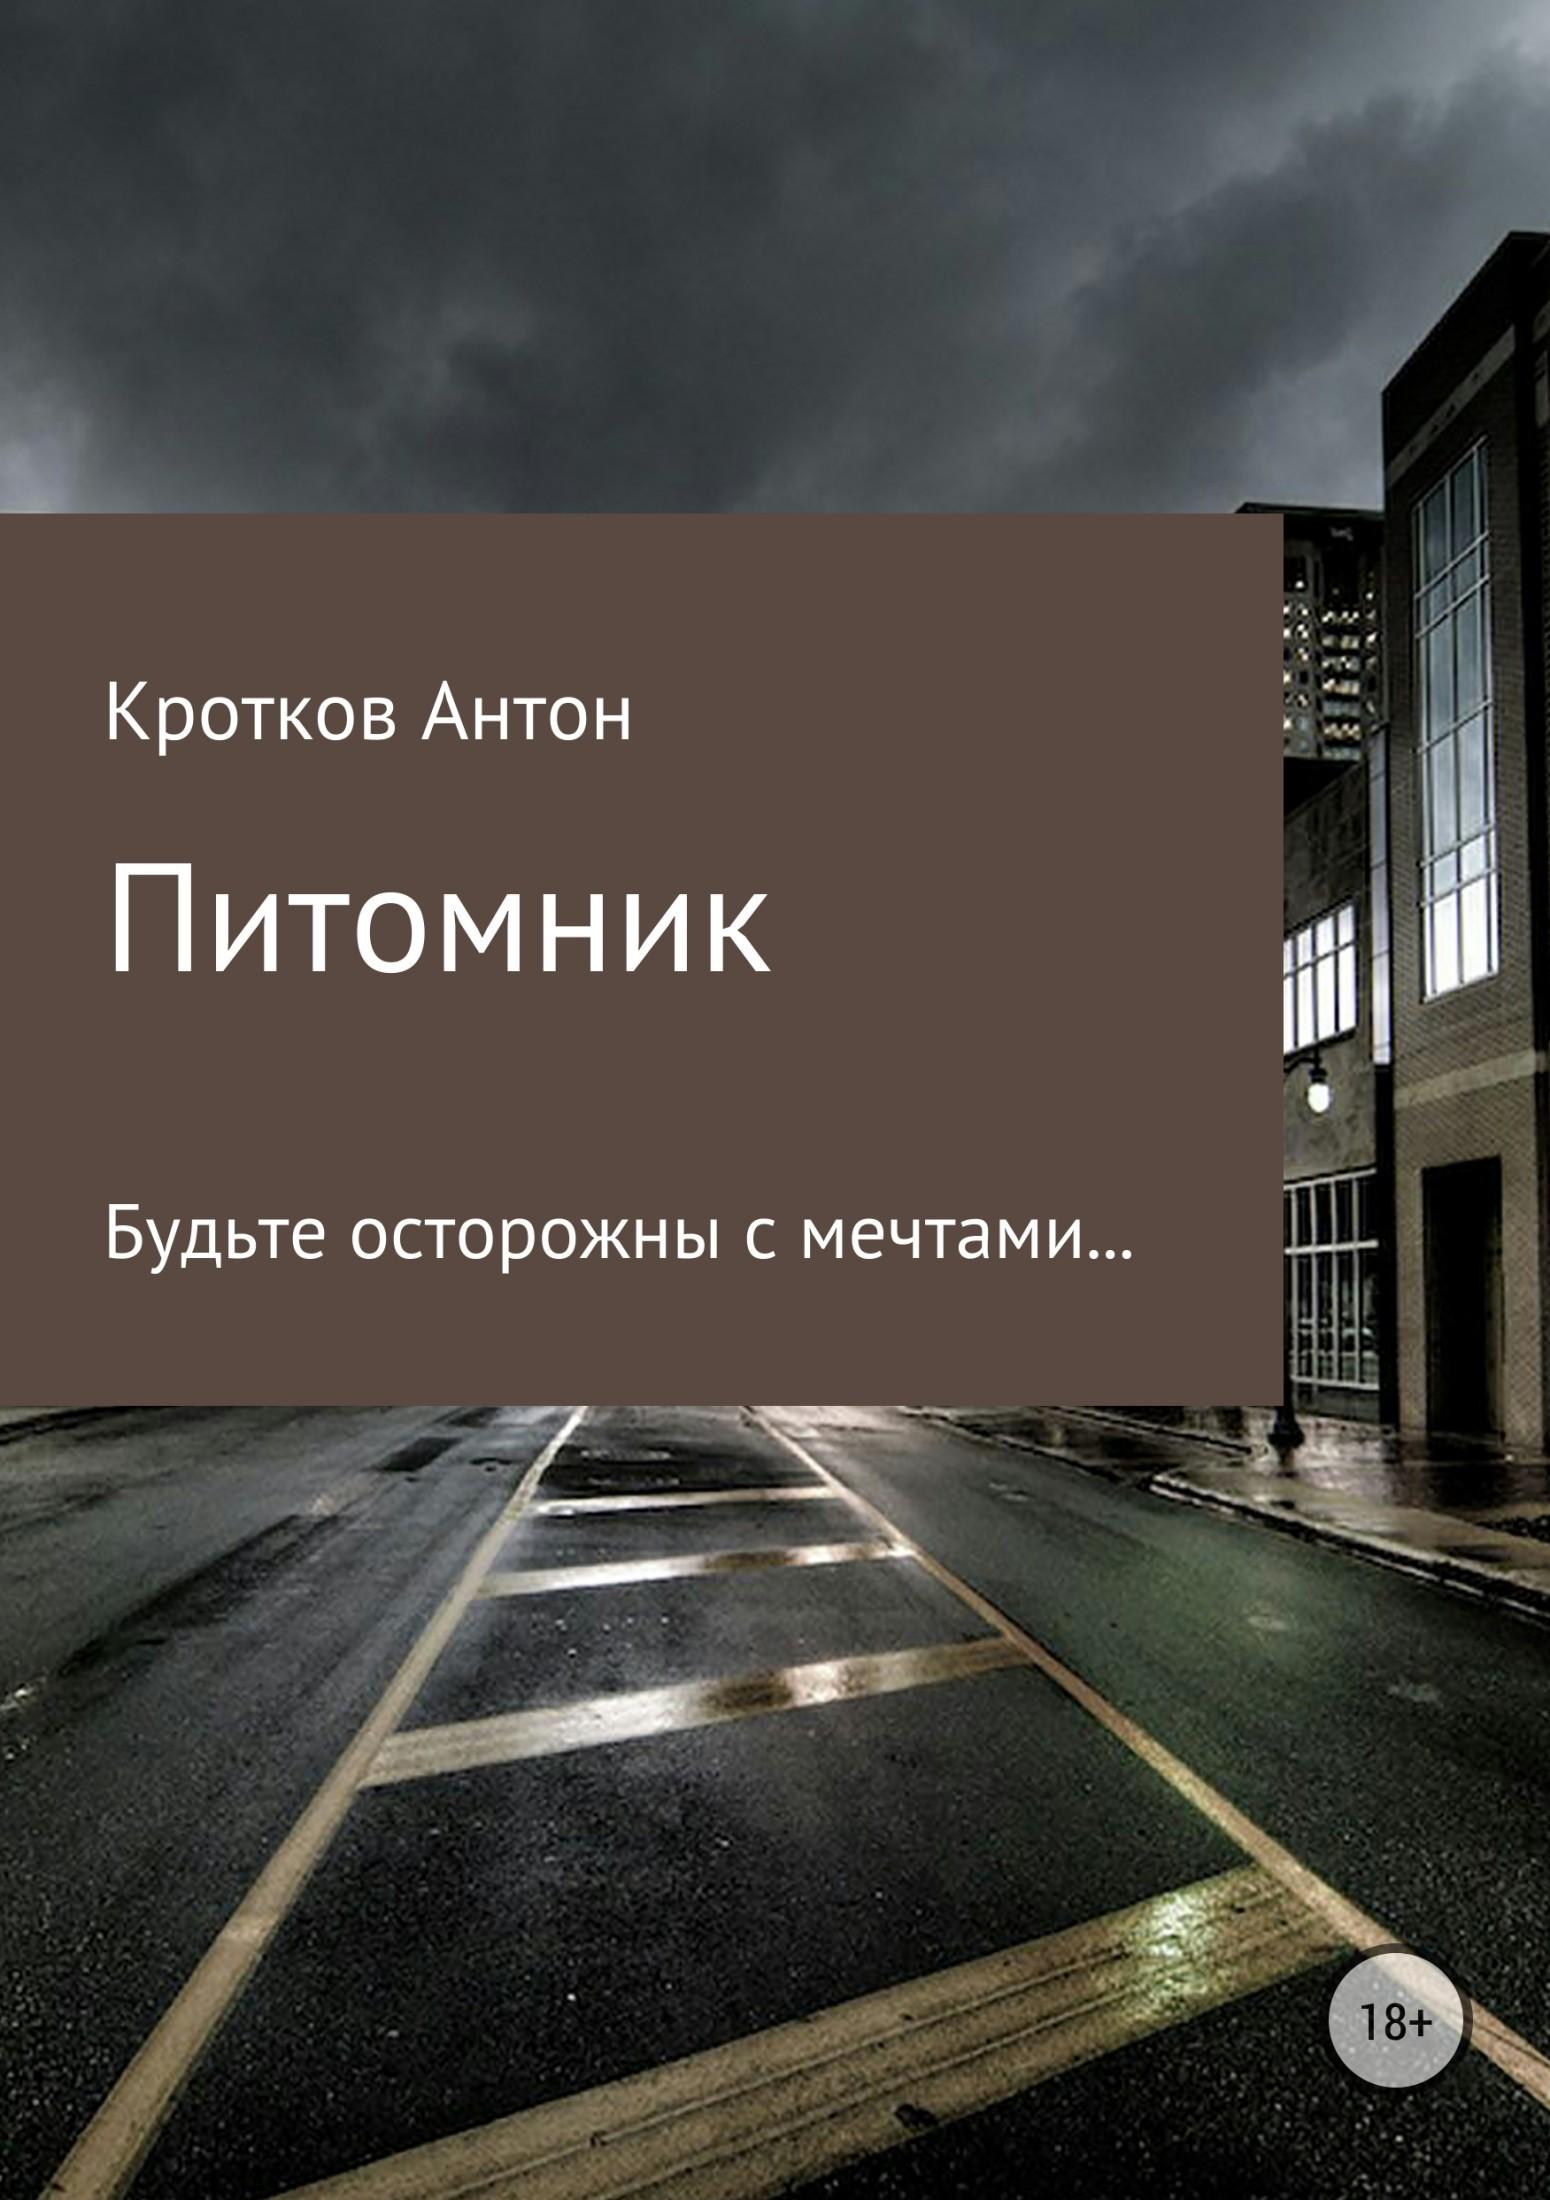 Антон Павлович Кротков Питомник антон павлович кротков последний вираж штрафбата